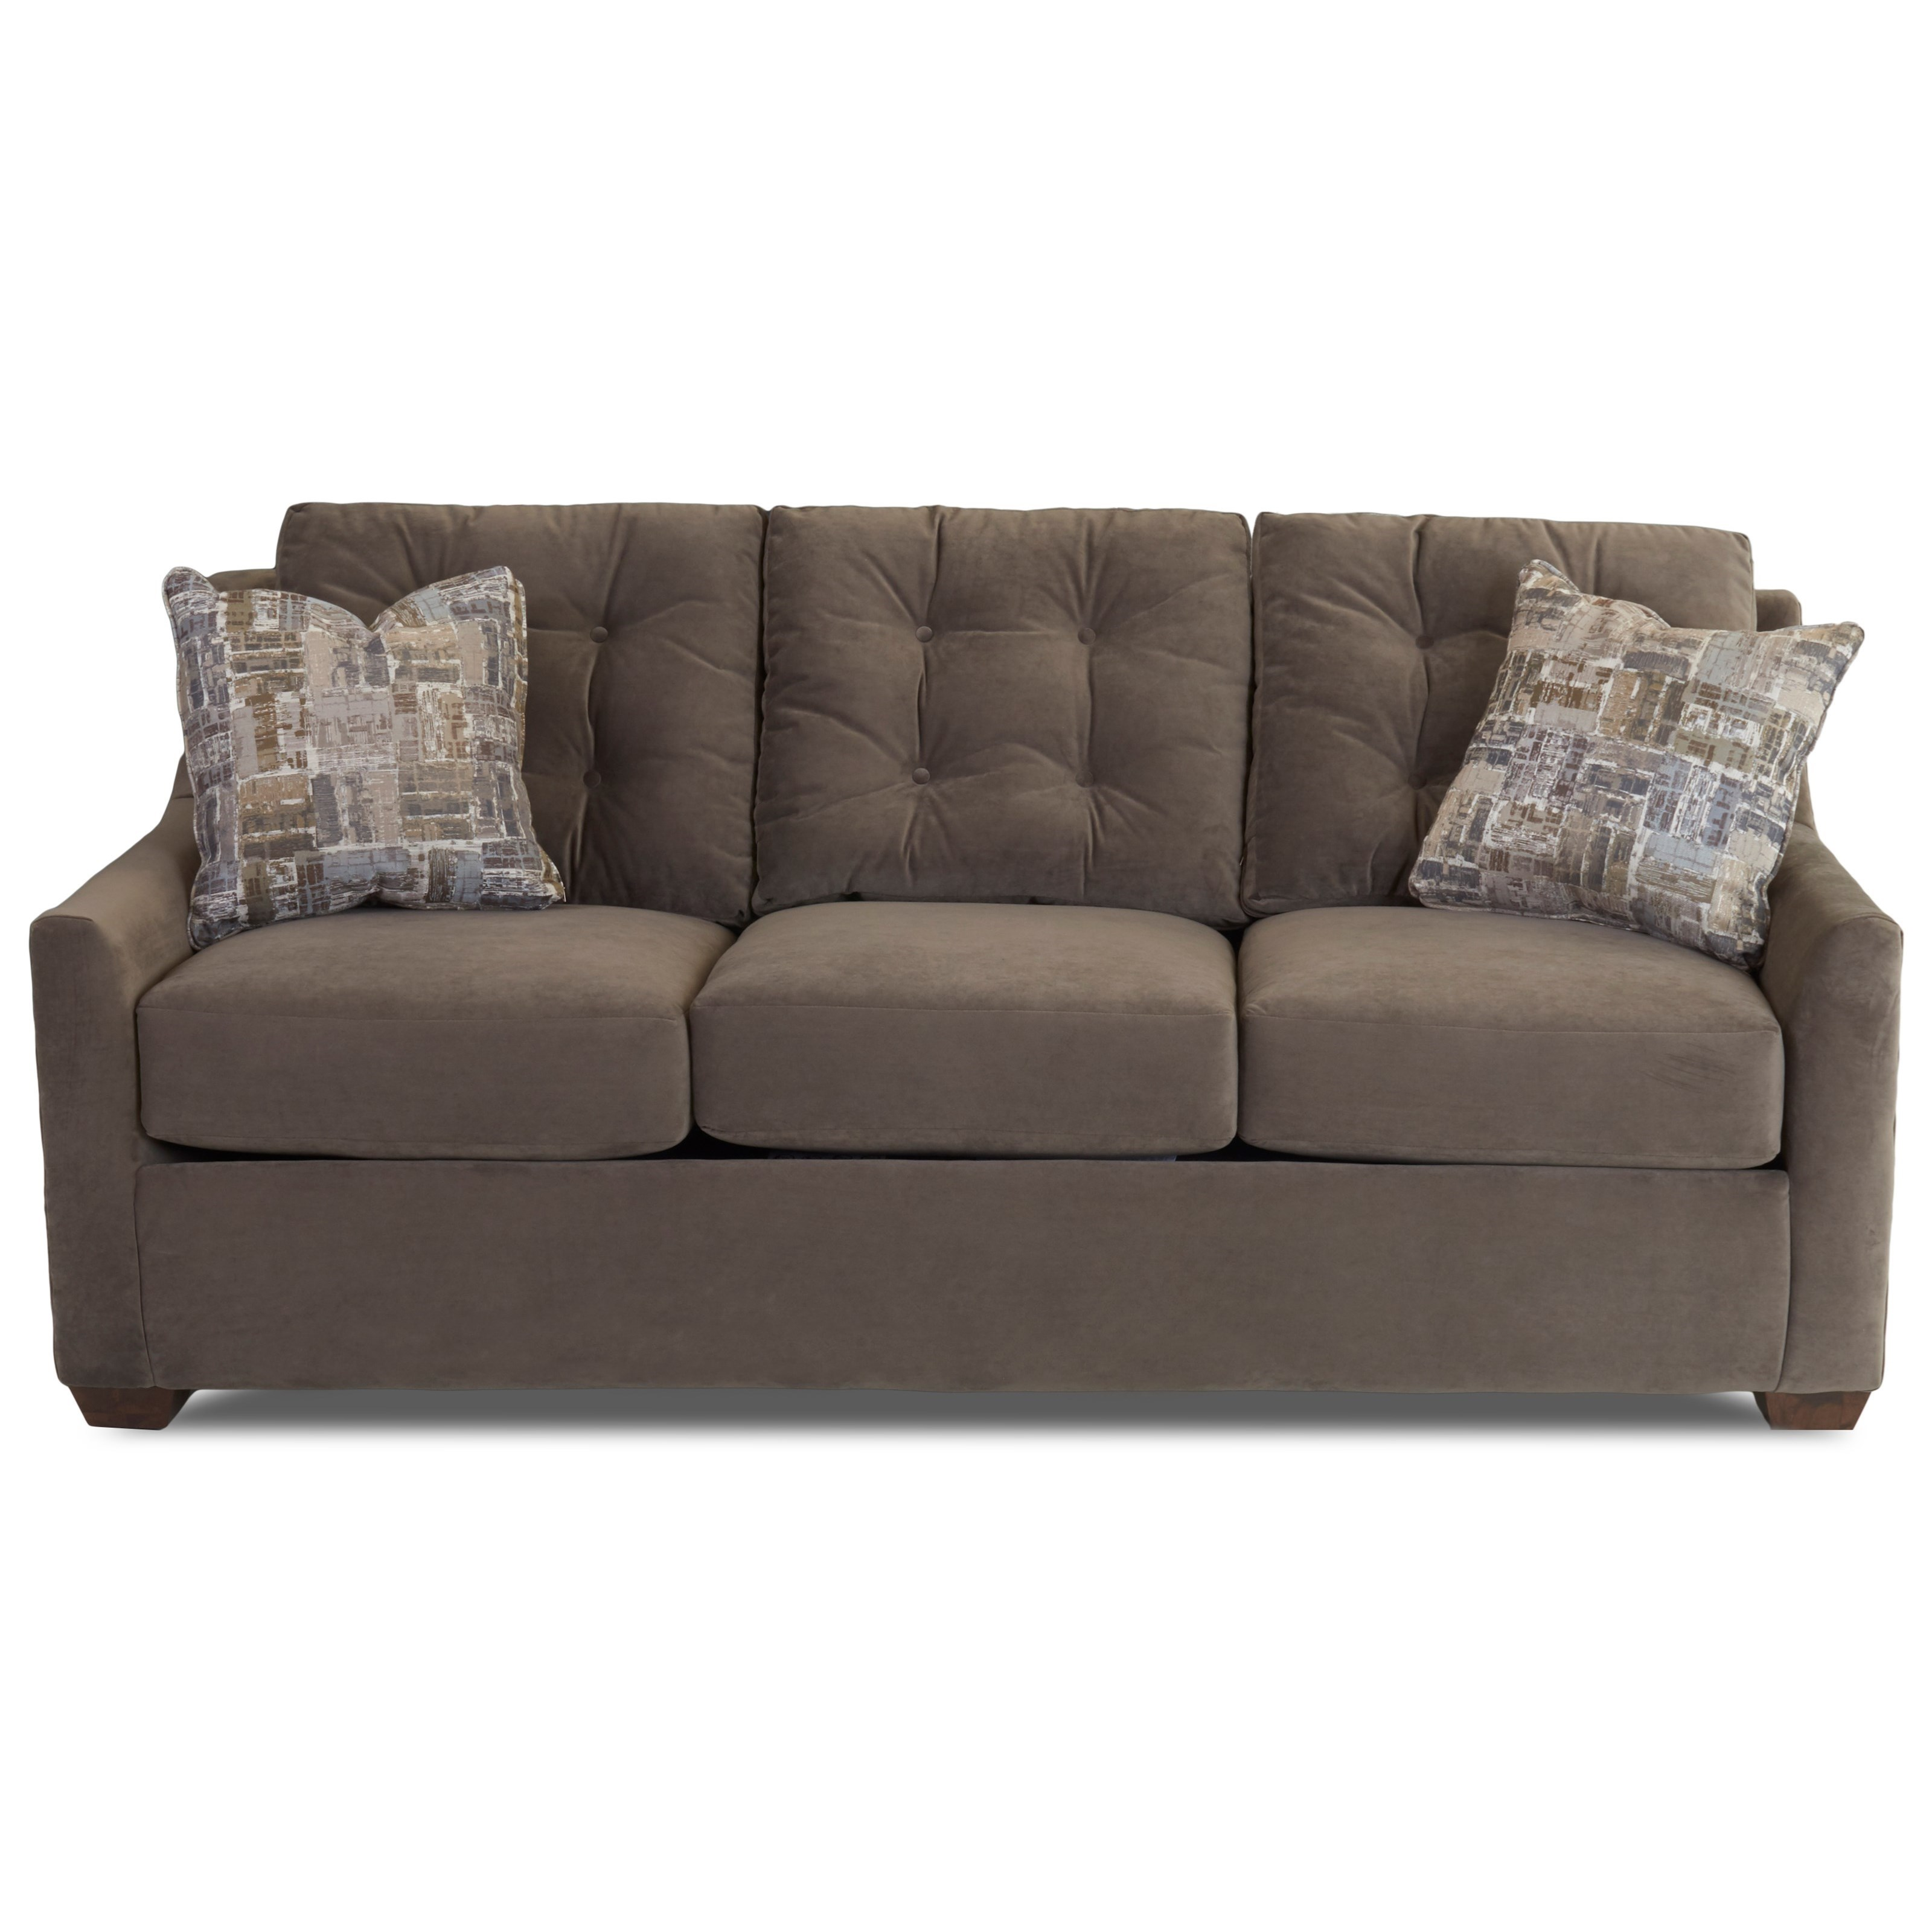 Grayton Queen Air Dream Sleeper Sofa by Klaussner at Johnny Janosik